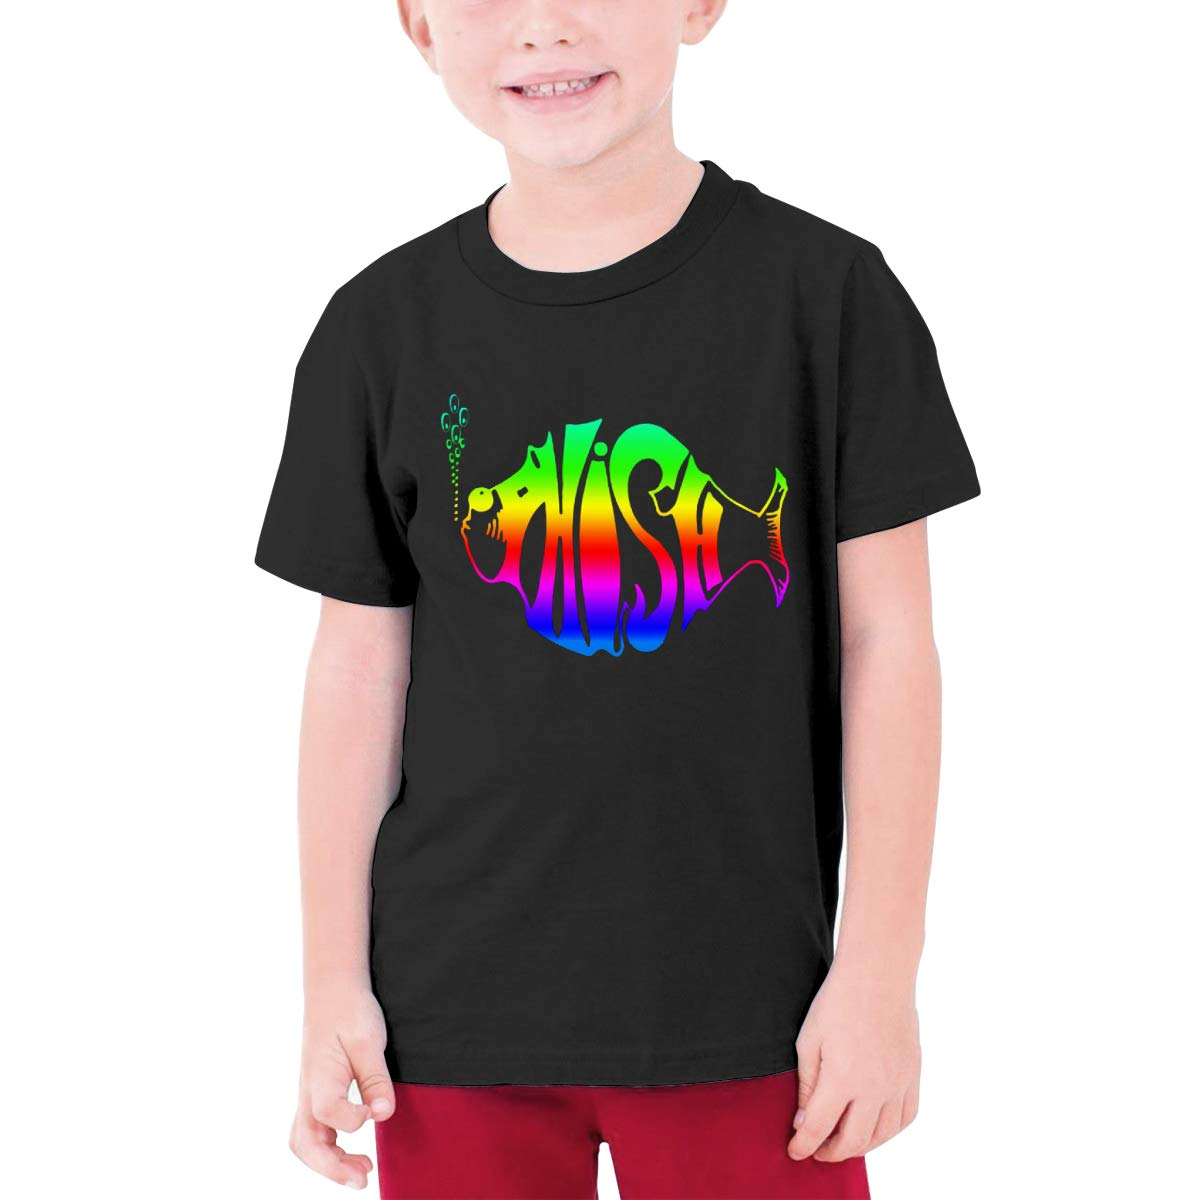 Kids Soft Cotton T Shirt Rainbow Phish Stylish Crewneck Short Sleeve Tops Black